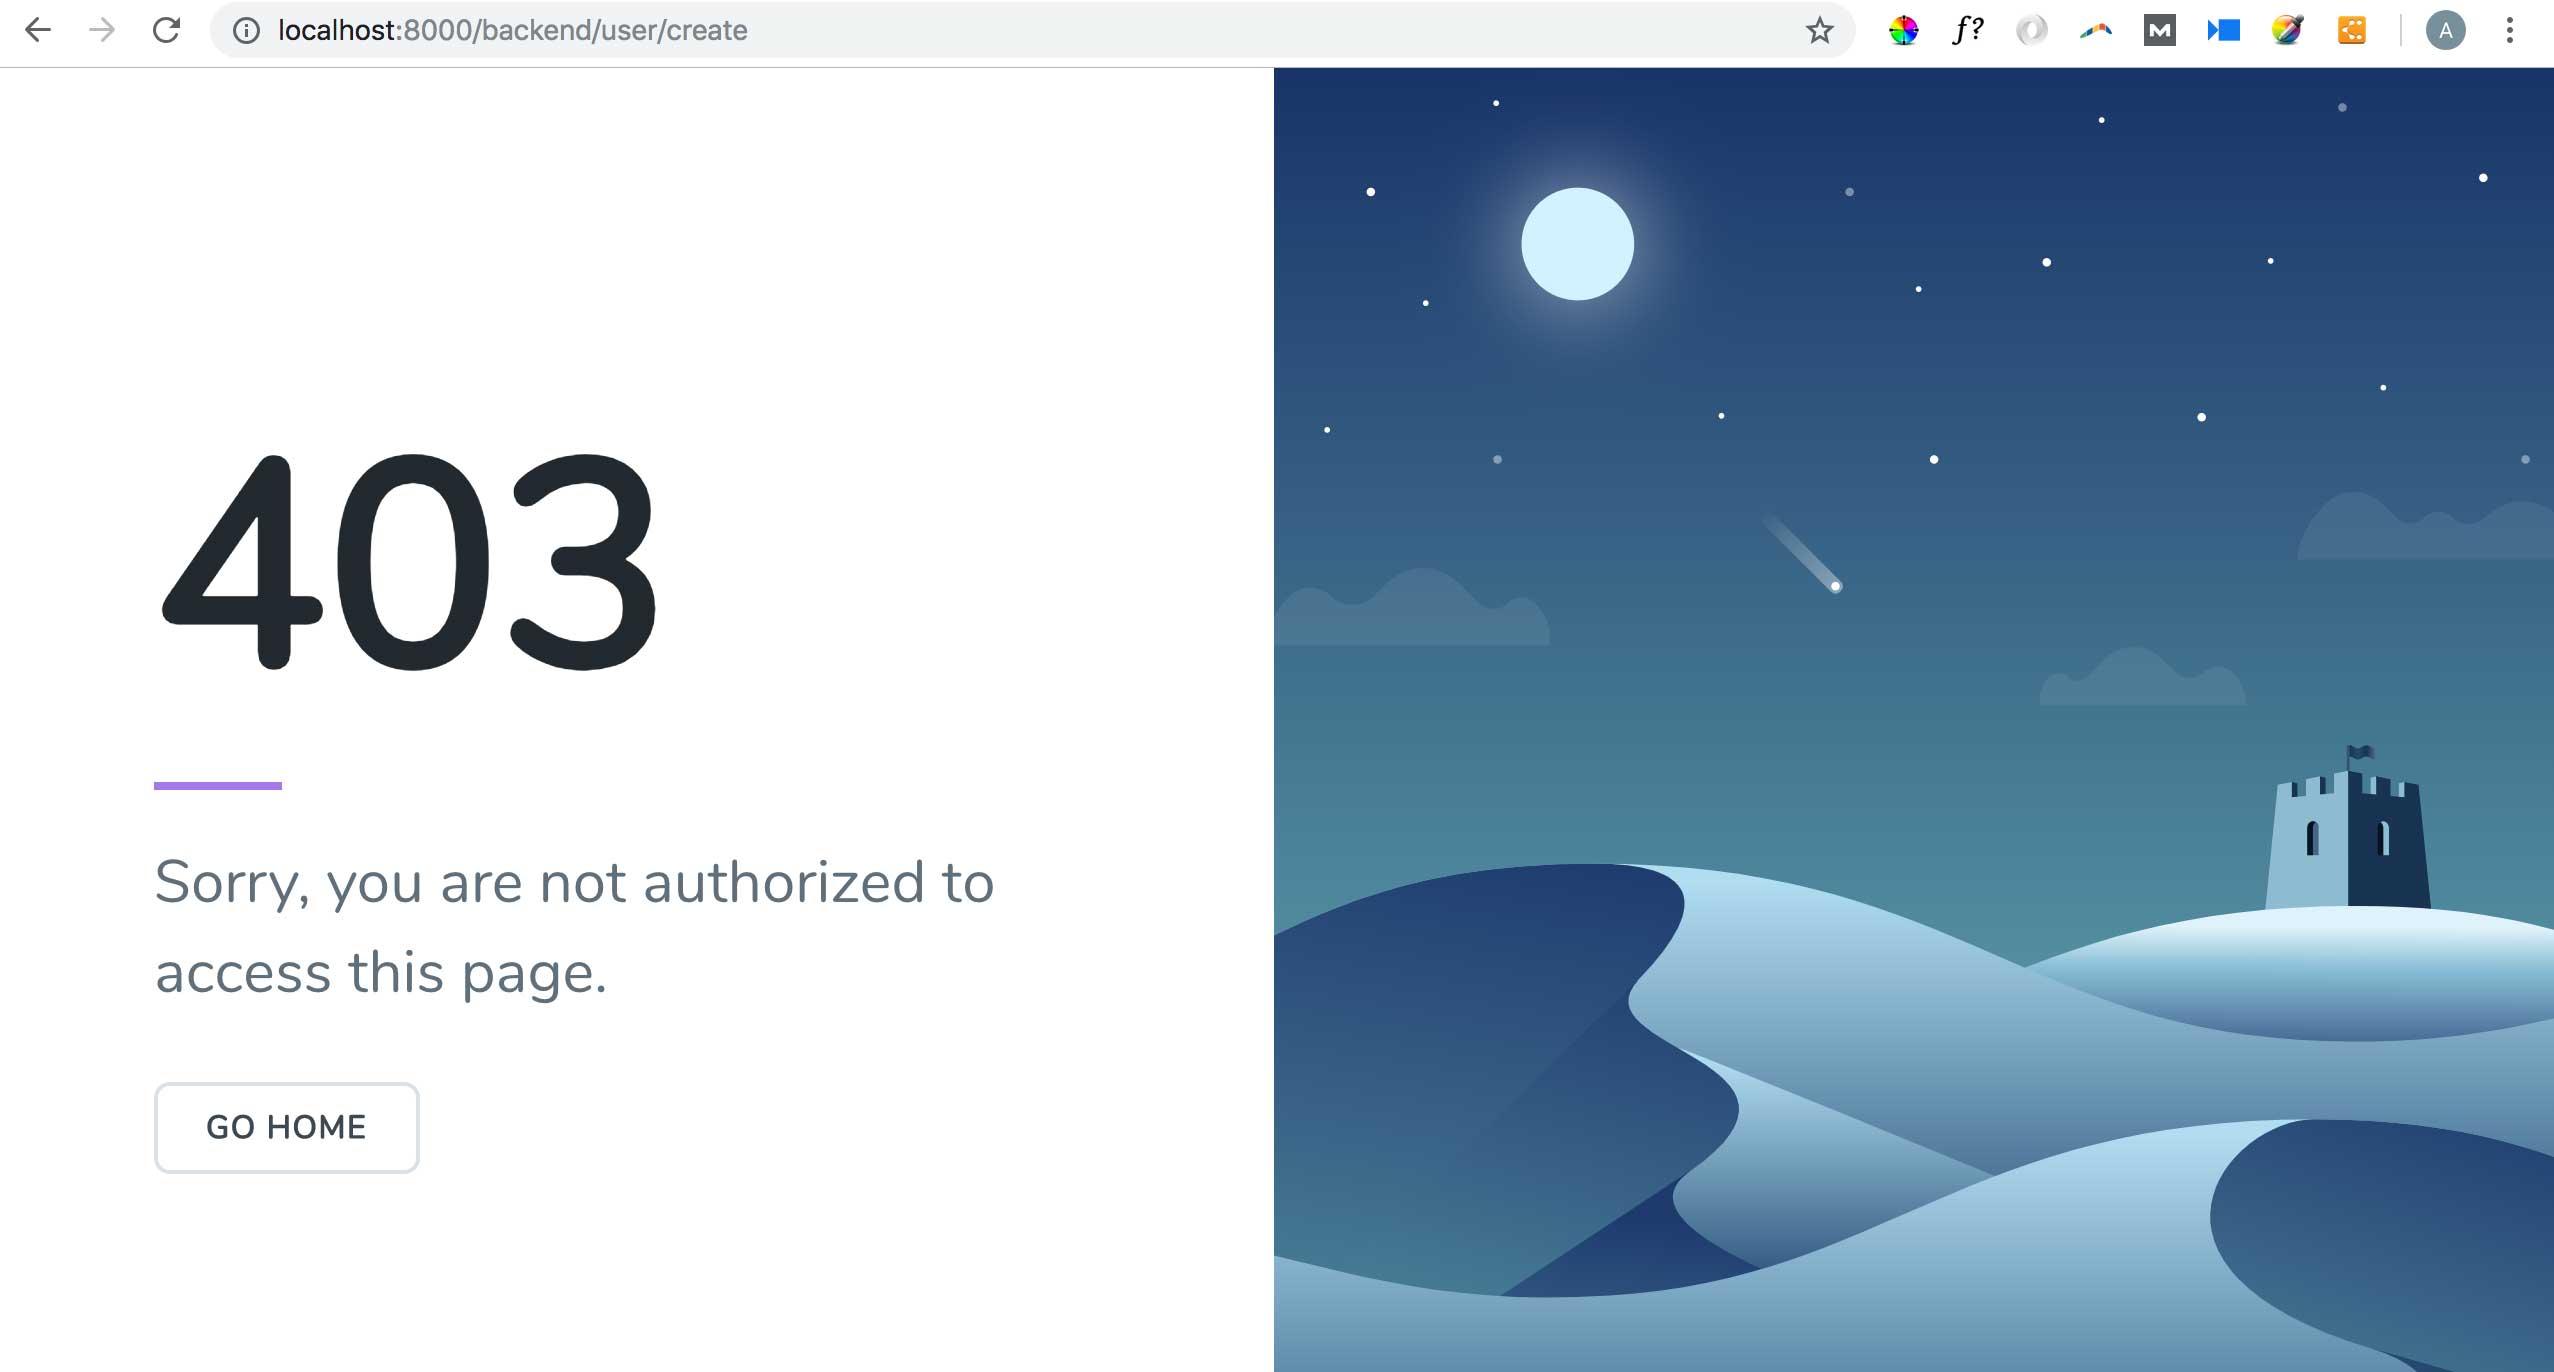 Access Control with Laratrust - WordPress-Like Blog Laravel 5.7 and AdminLTE 3 (17)